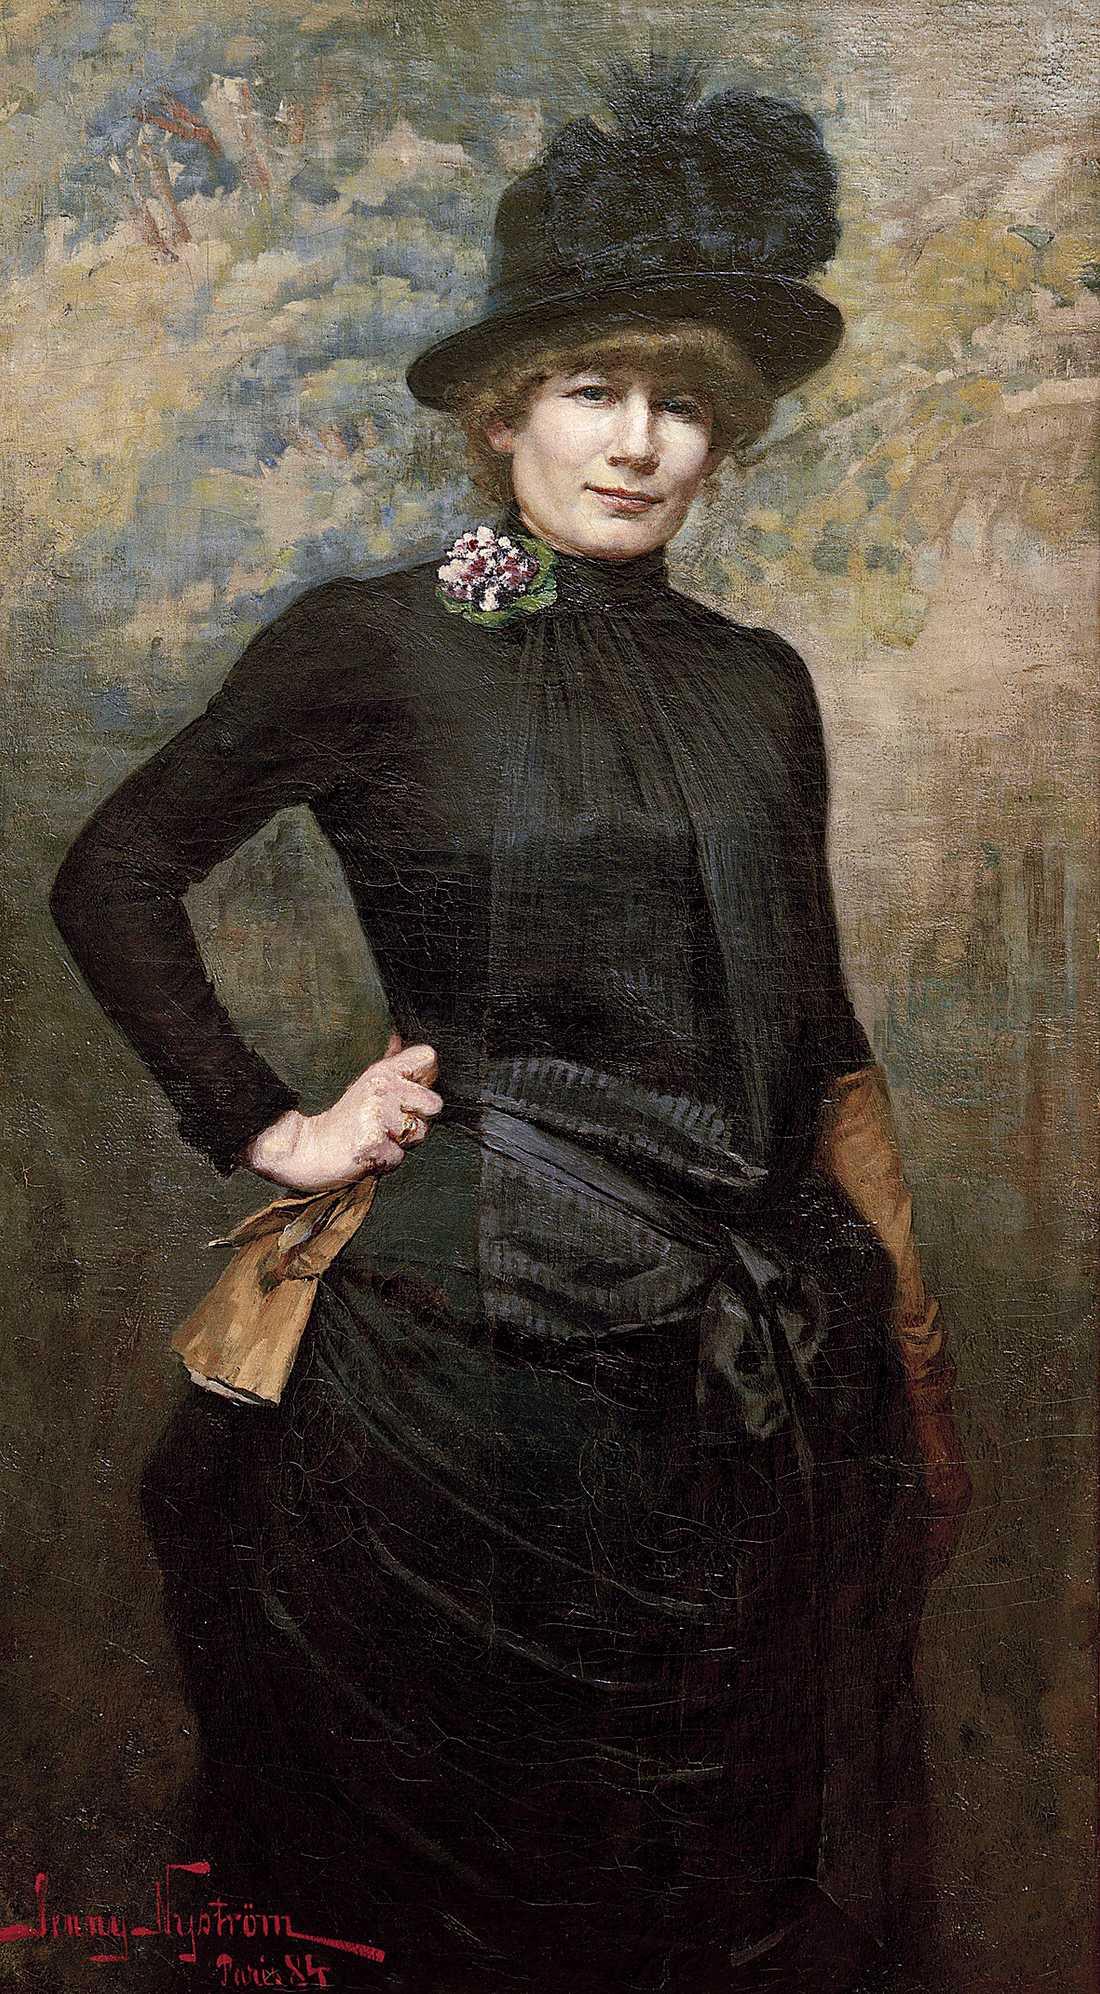 Jenny Nyström (1854–1946), självporträtt målat i Paris 1884, olja på duk.